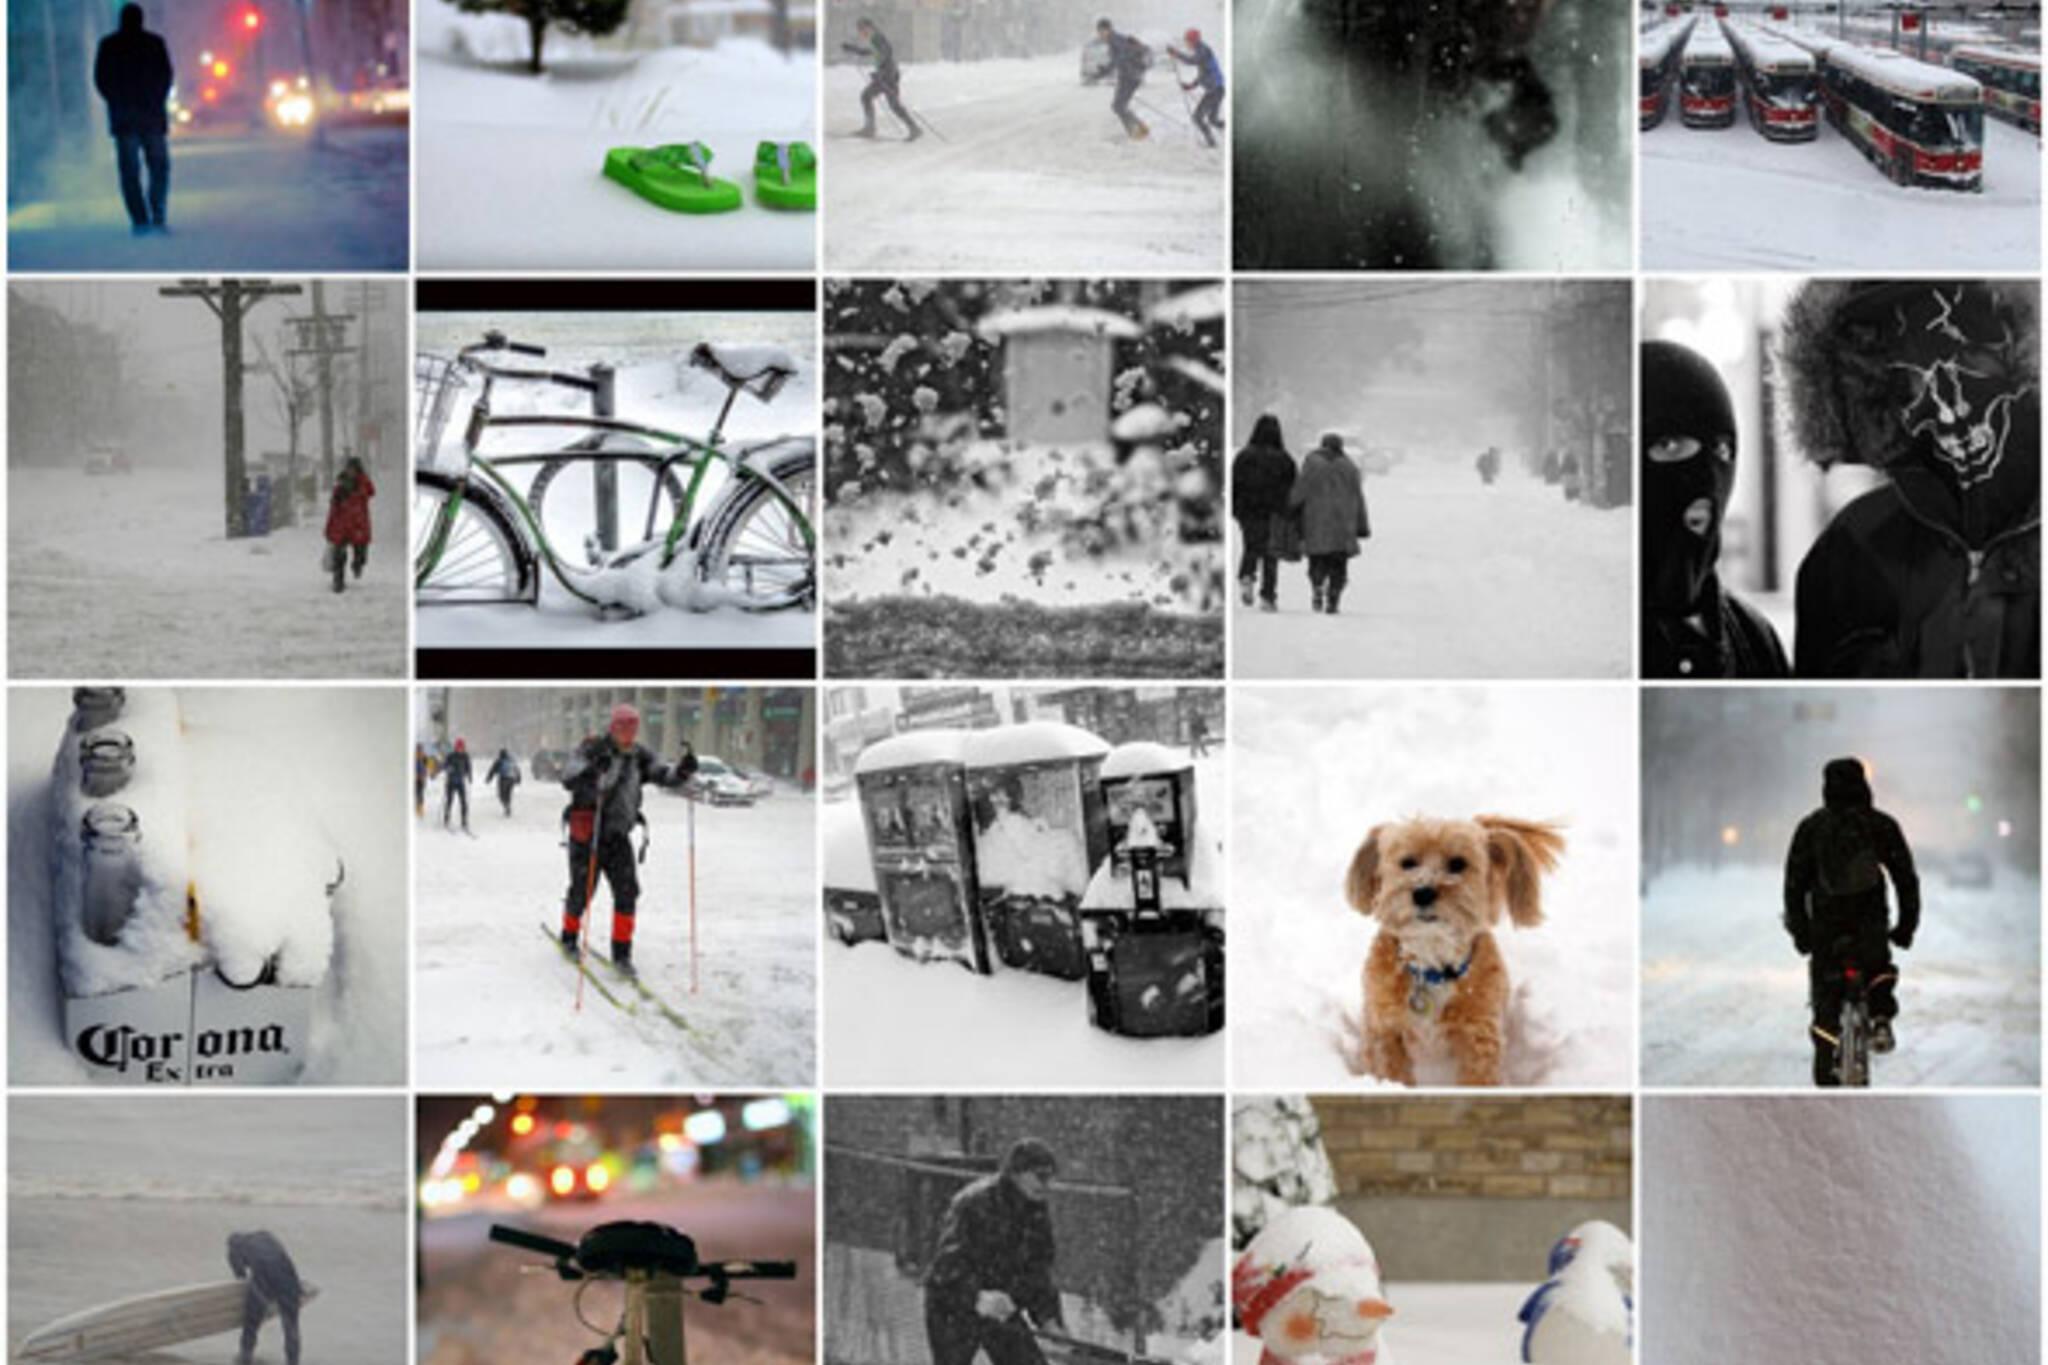 Toronto Snowstorm December 2007 Photos